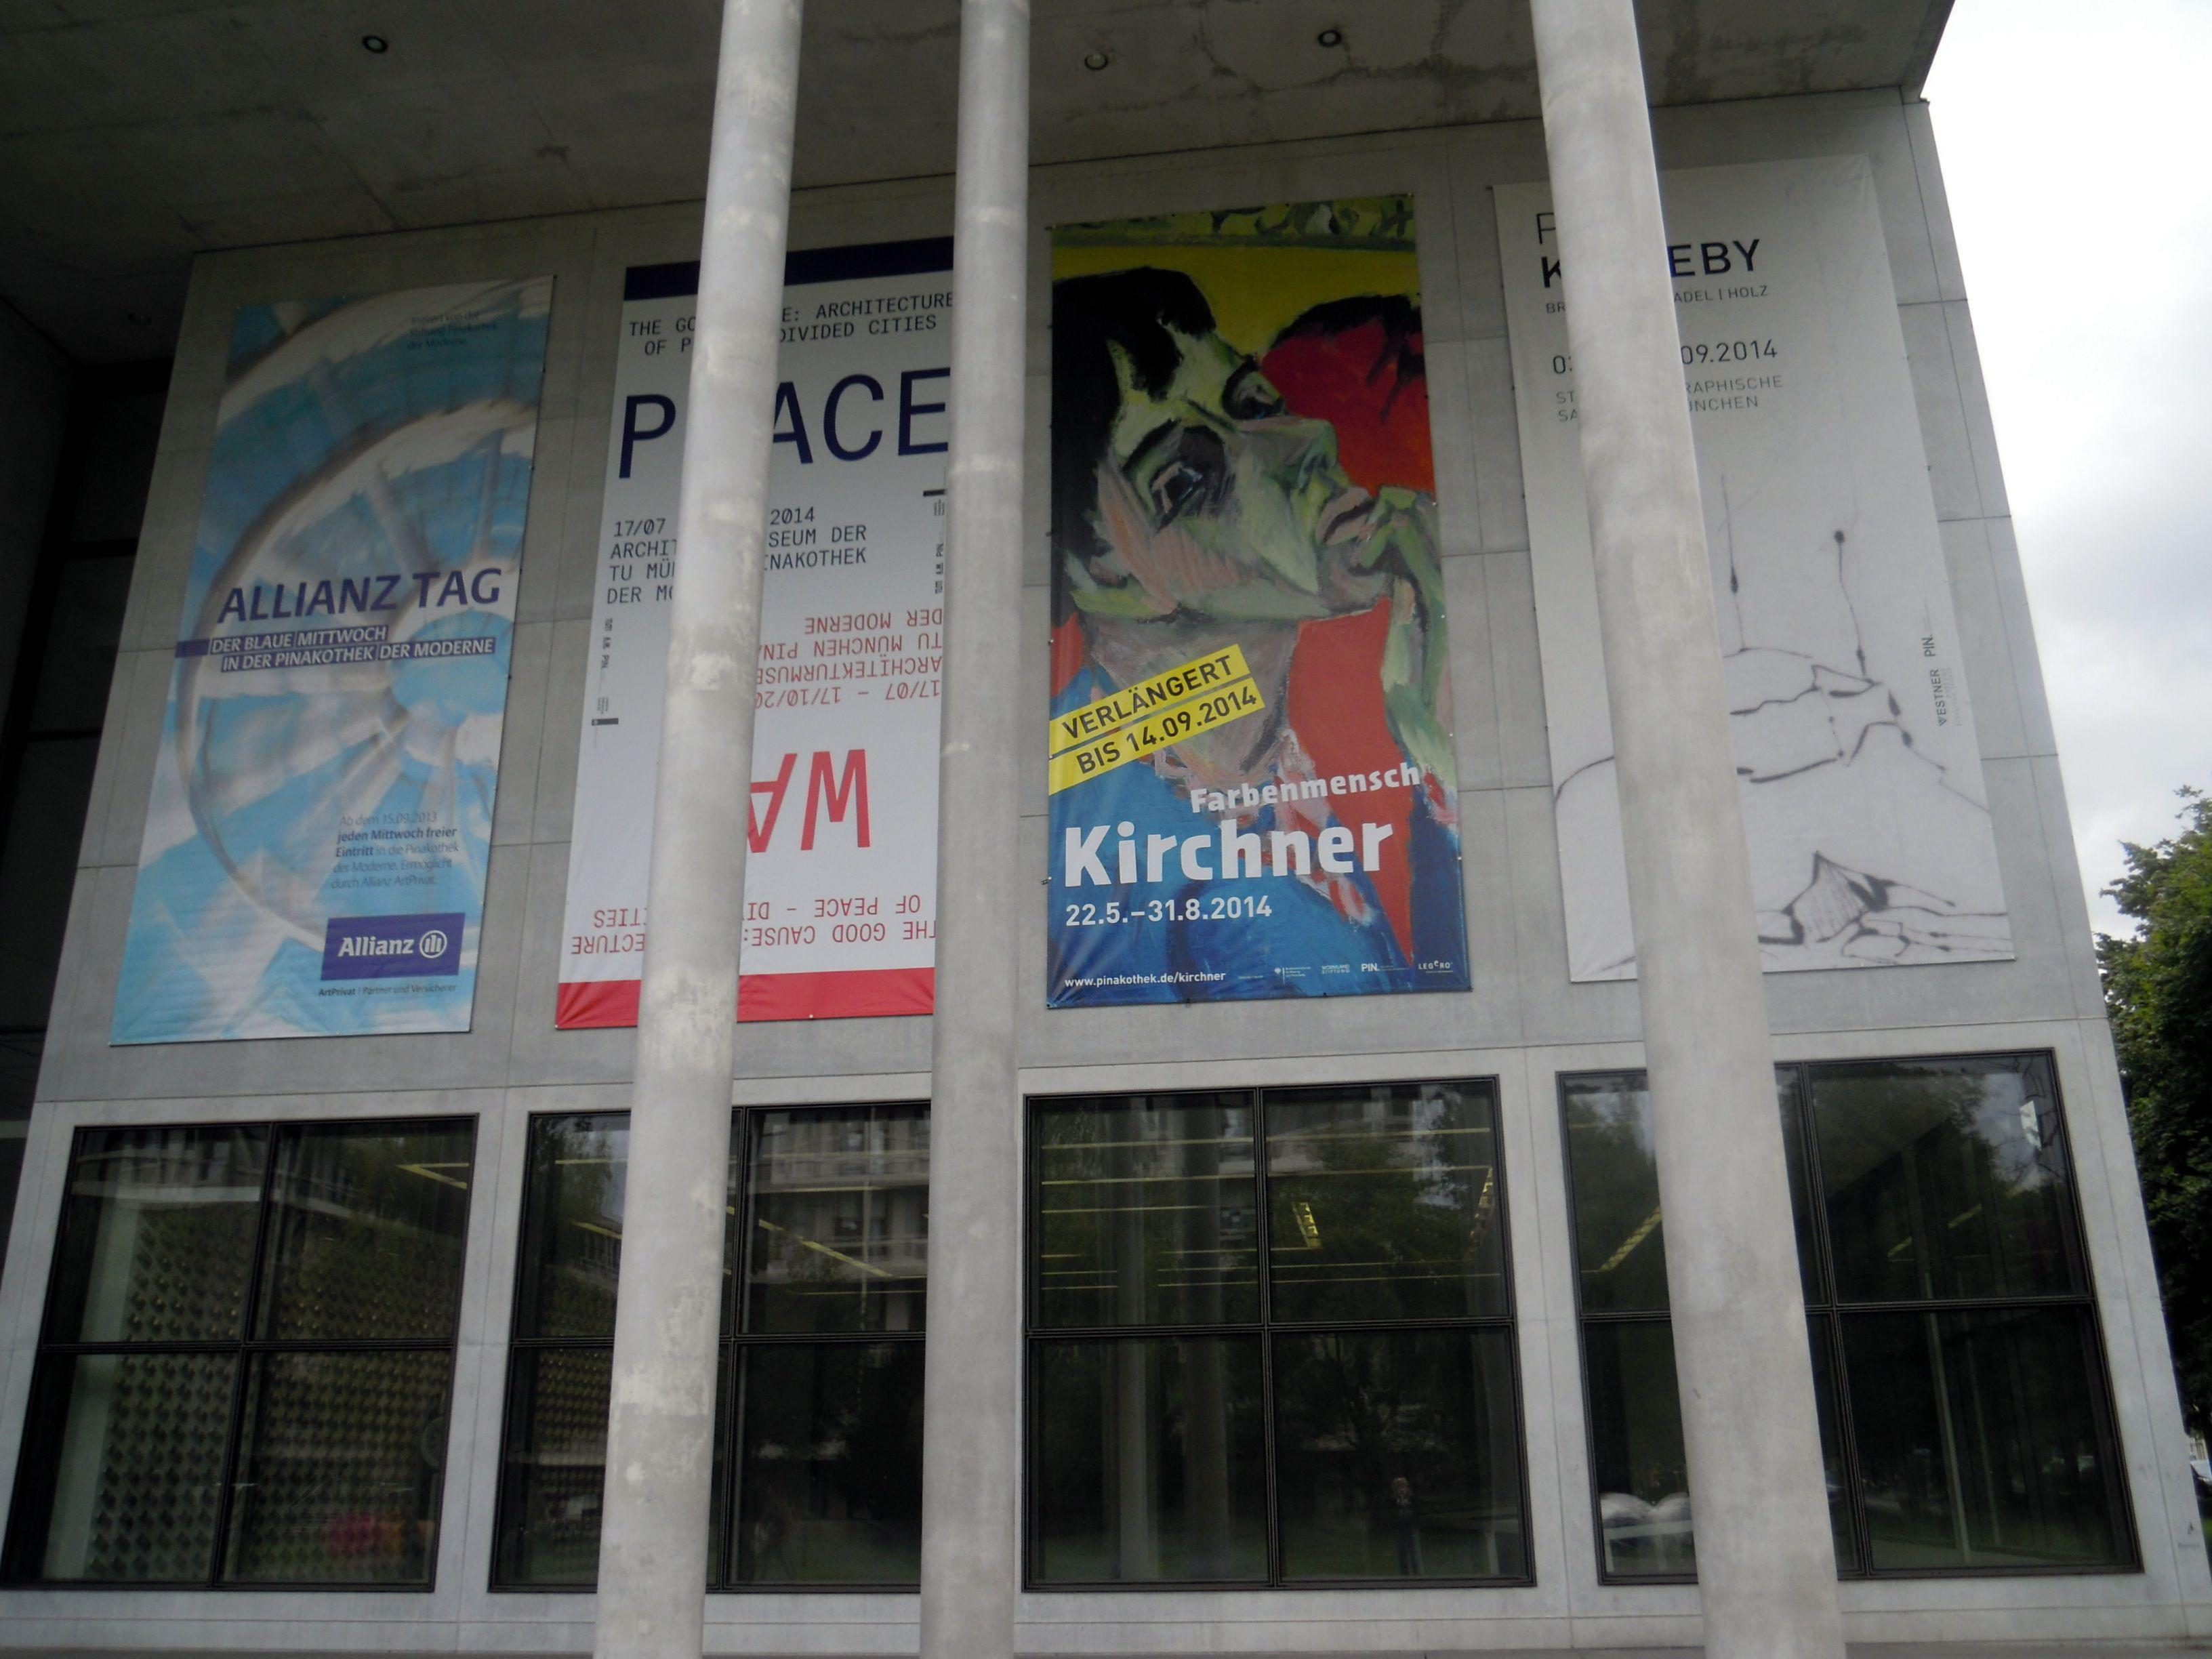 Pinakothek Der Moderne Munchen Pinakothek Der Moderne Munchen Abstrakt